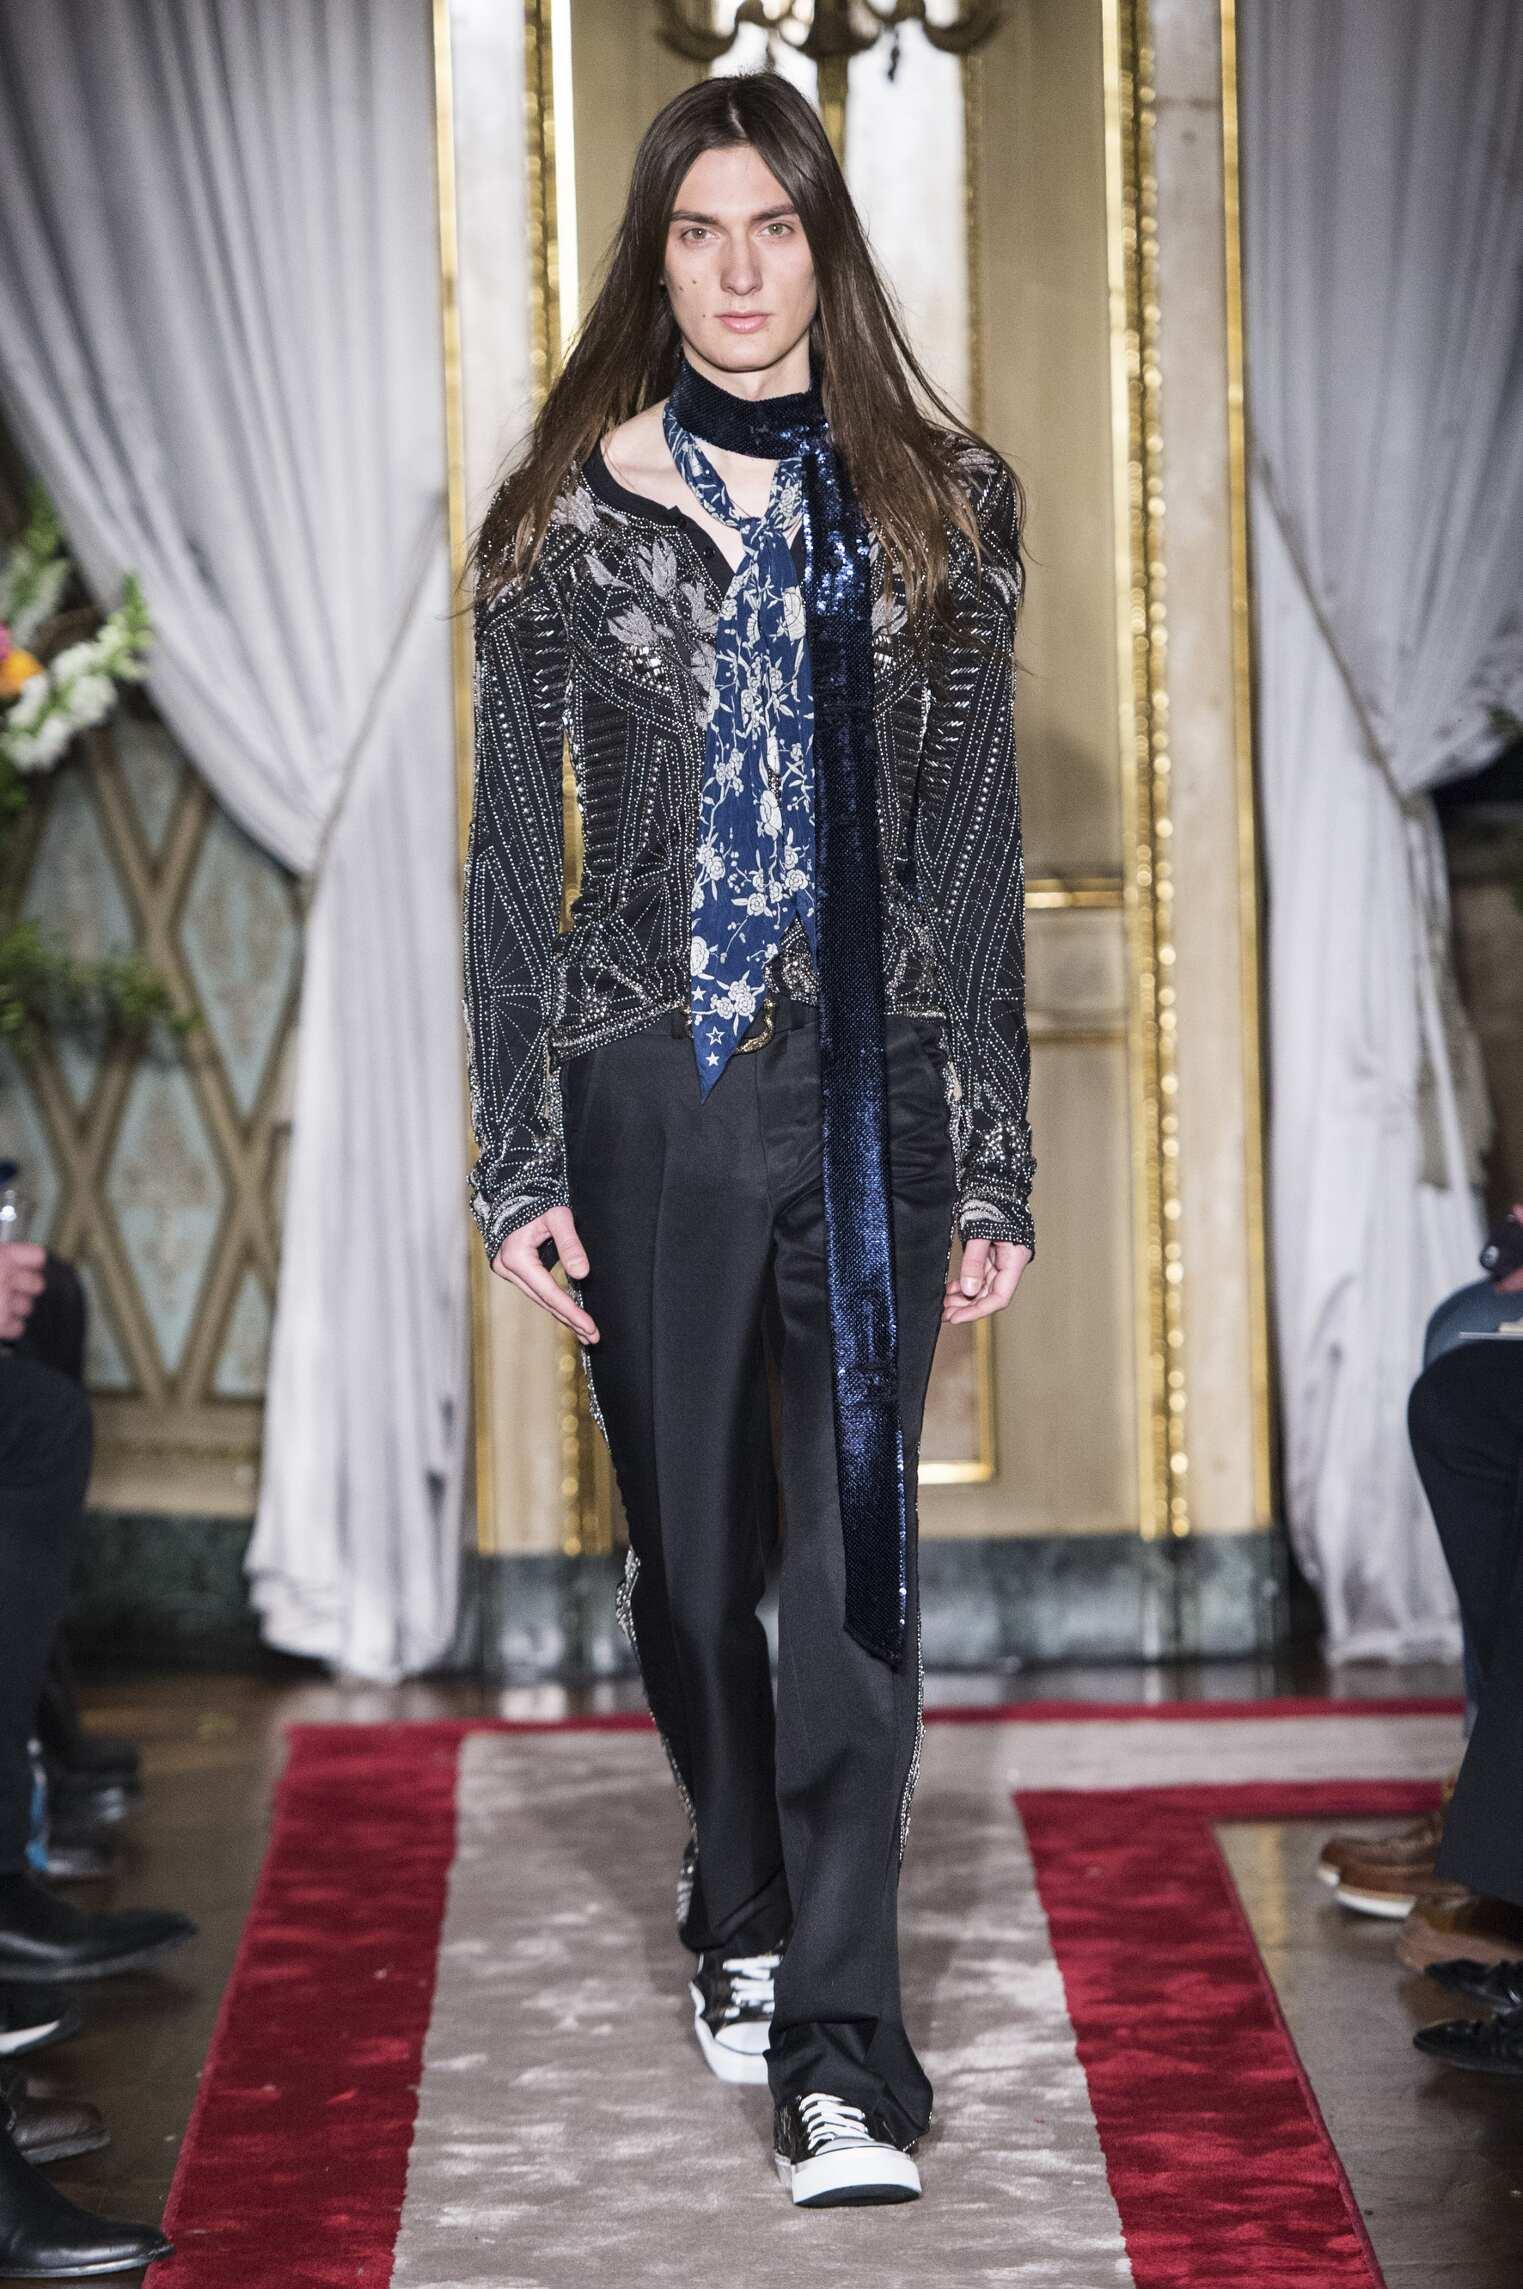 Catwalk Roberto Cavalli Man Fashion Show Winter 2016